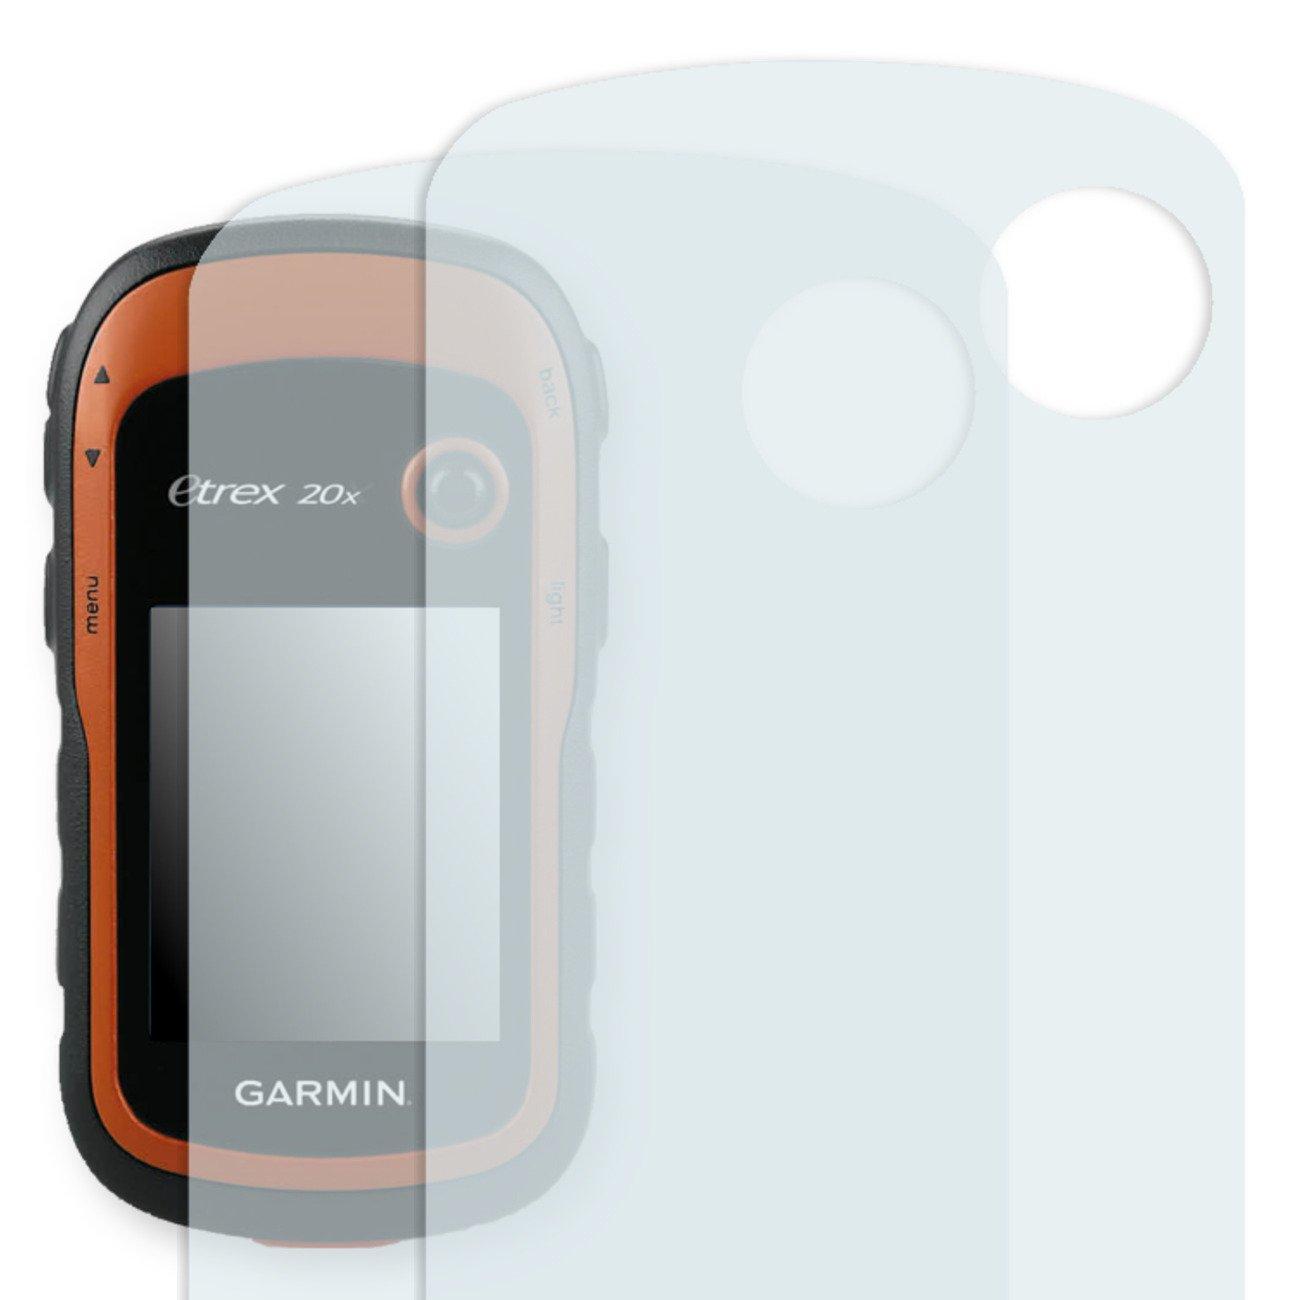 2X Golebo Anti-Glare Screen Protector for Garmin eTrex 20 (Anti-Reflex, Air Pocket Free Application, Easy to Remove)